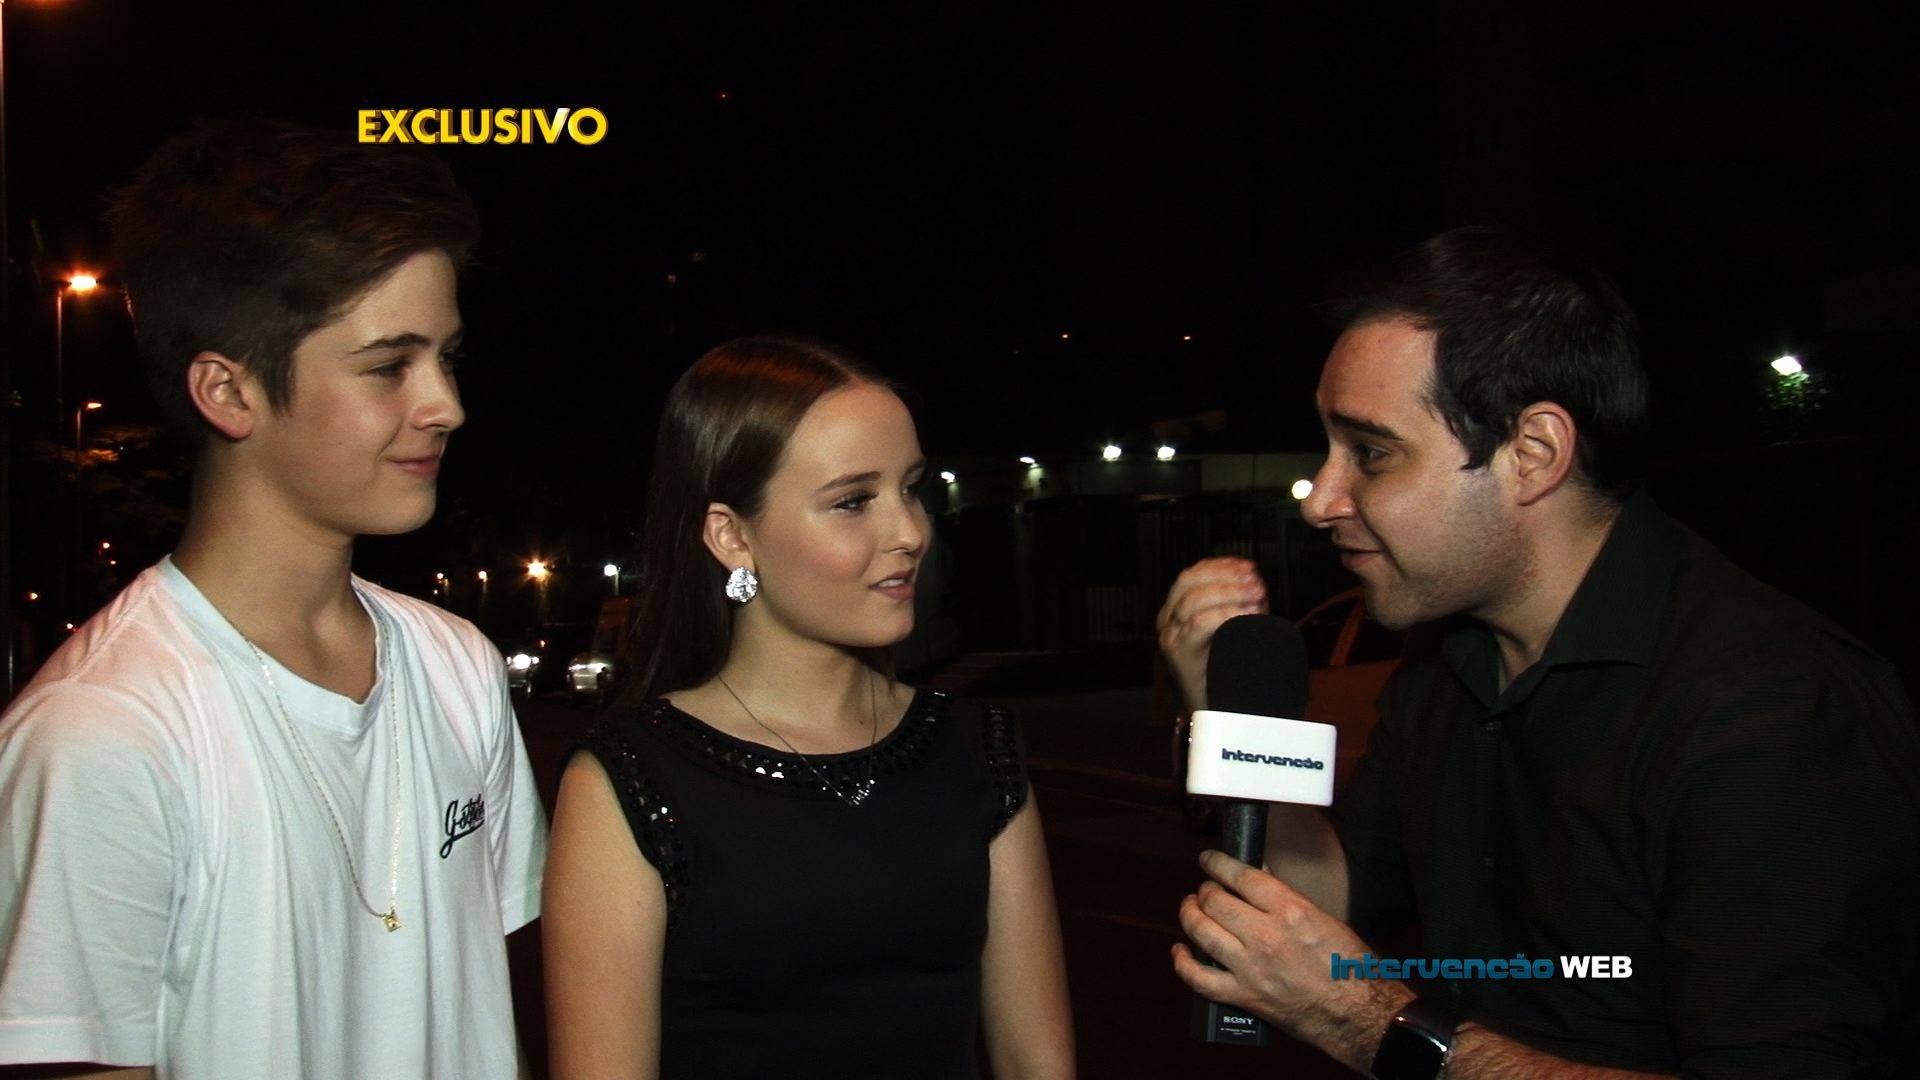 Roger Turchetti entrevista João Guilherme e Larrisa Manoela (Foto: Reprodução)